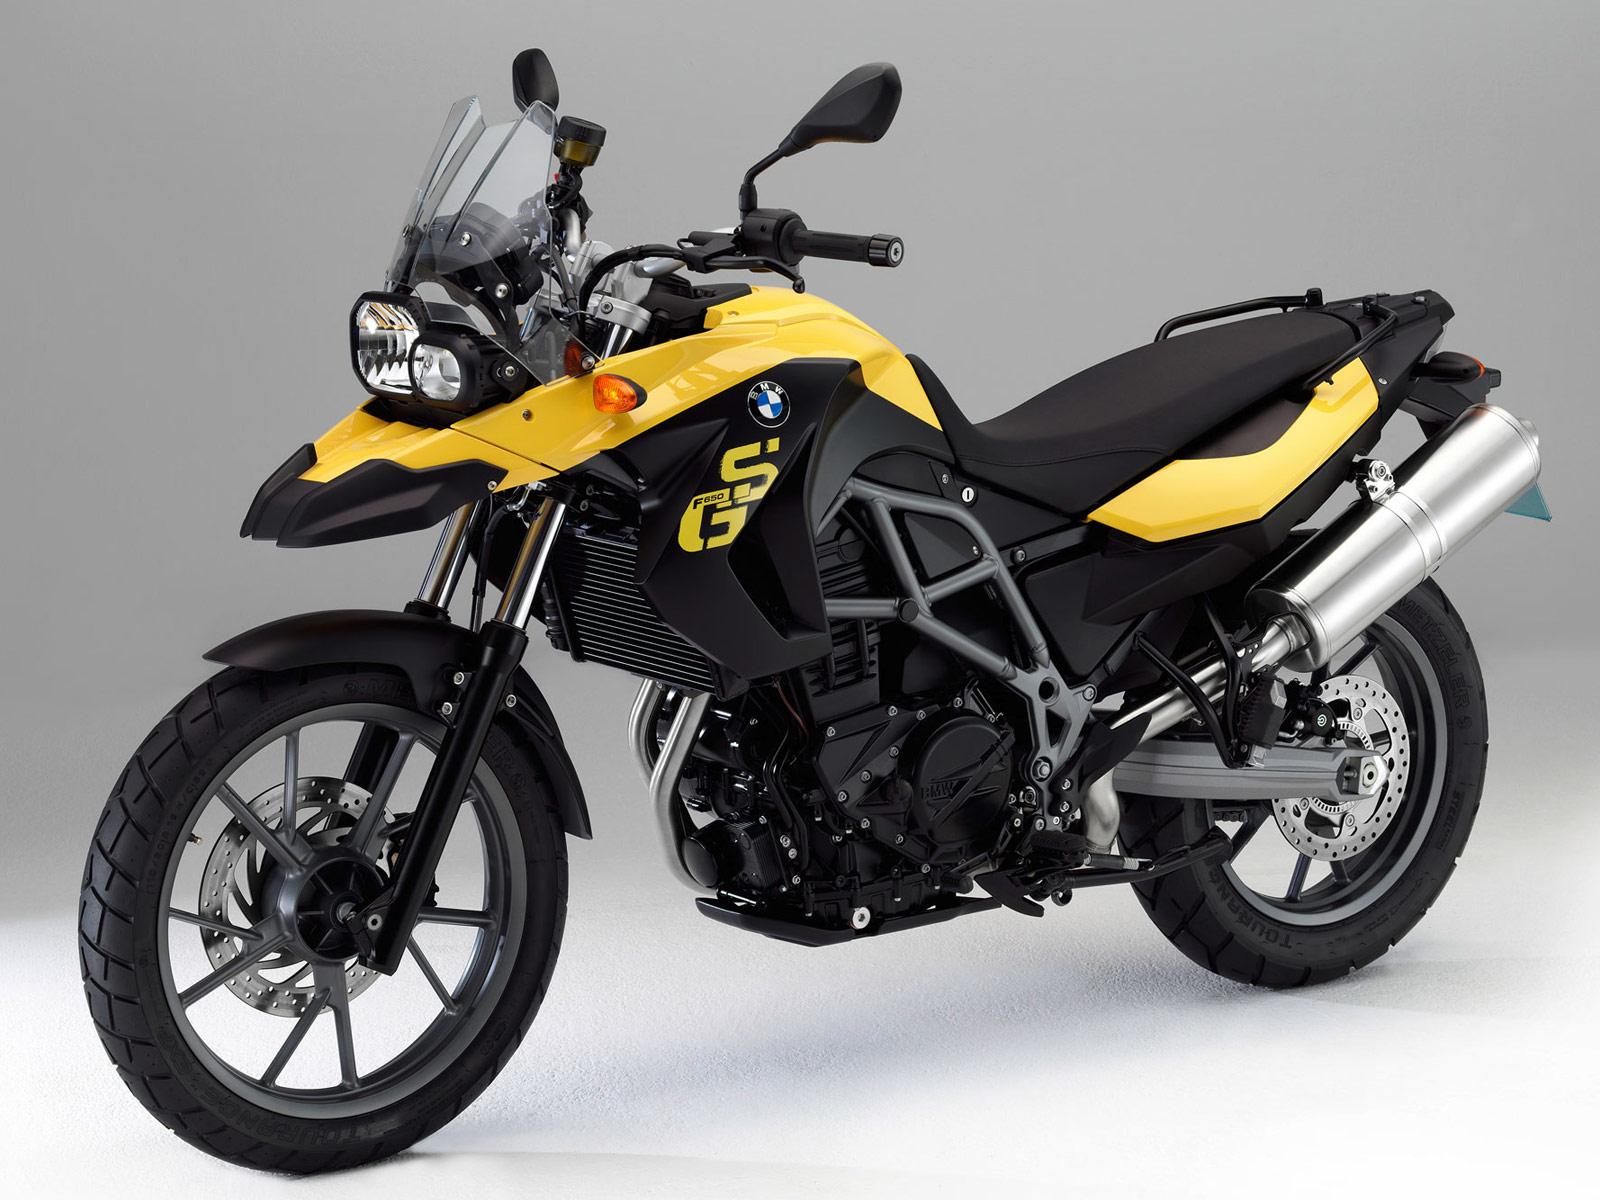 2012 bmw f650gs motorcycle insurance information. Black Bedroom Furniture Sets. Home Design Ideas